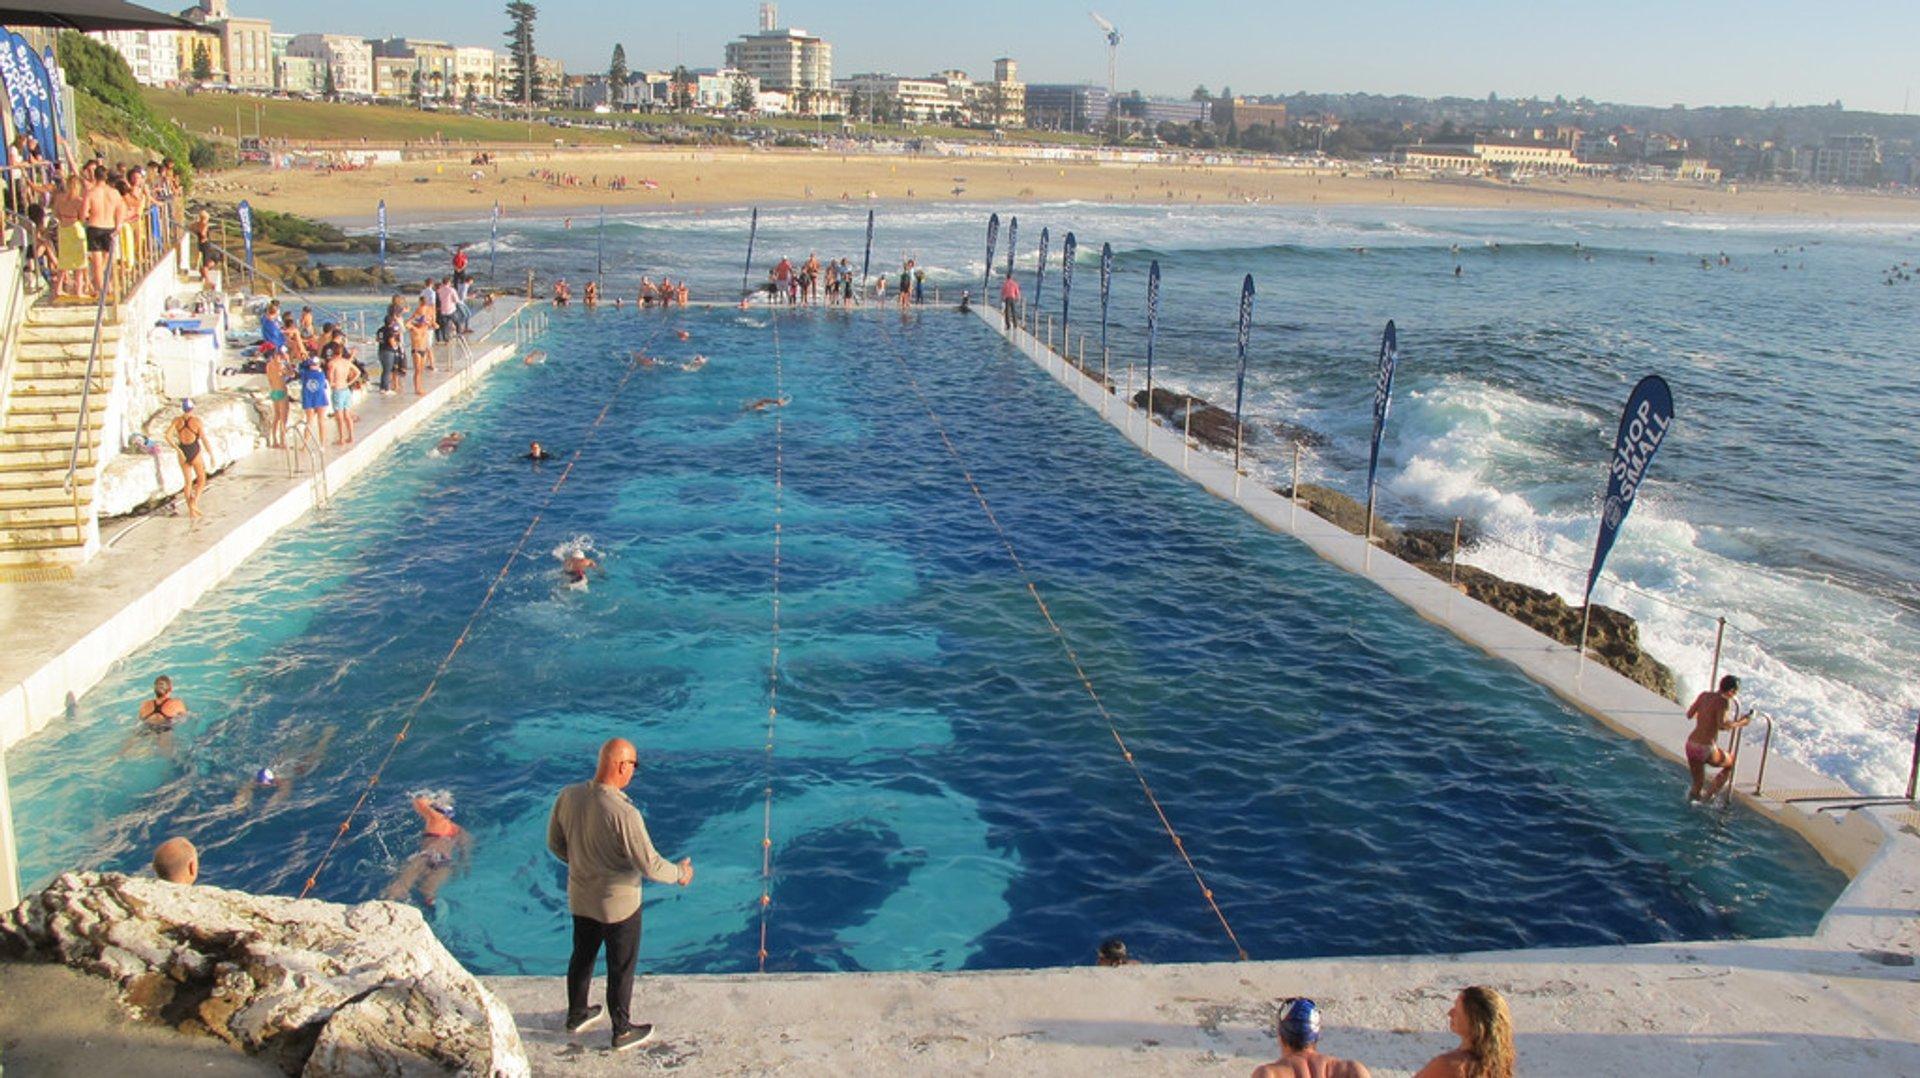 Bondi Icebergs Pool in Sydney - Best Season 2019